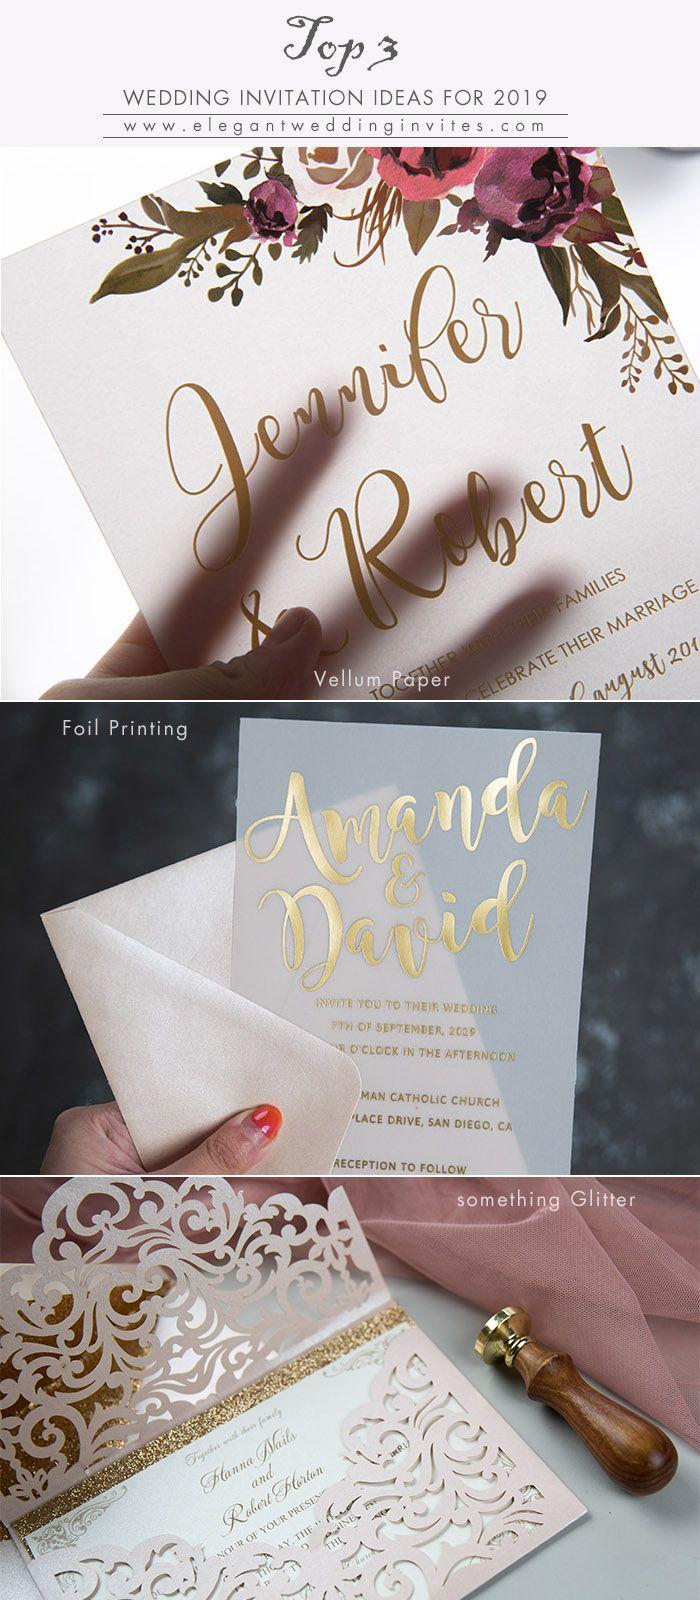 top 3 wedding invitation ideas for 2019 wedding trends